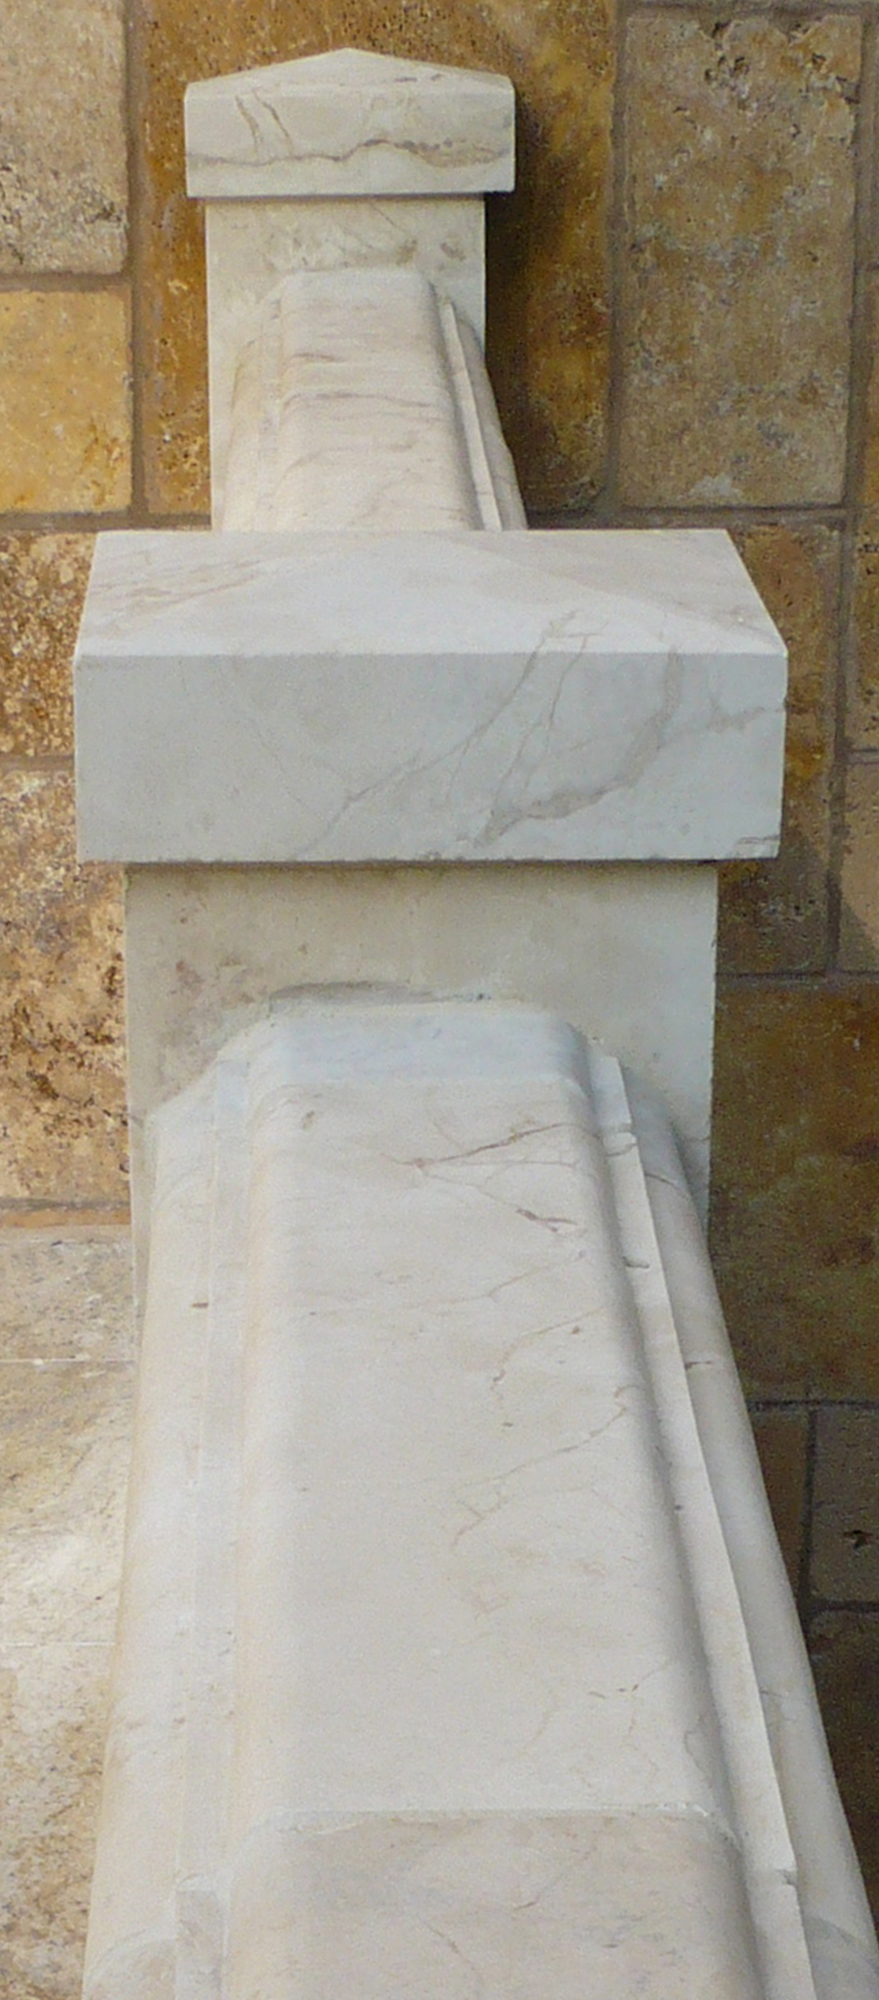 Dalloul_baluster handrail detail_P1070532_2000x879px.jpg